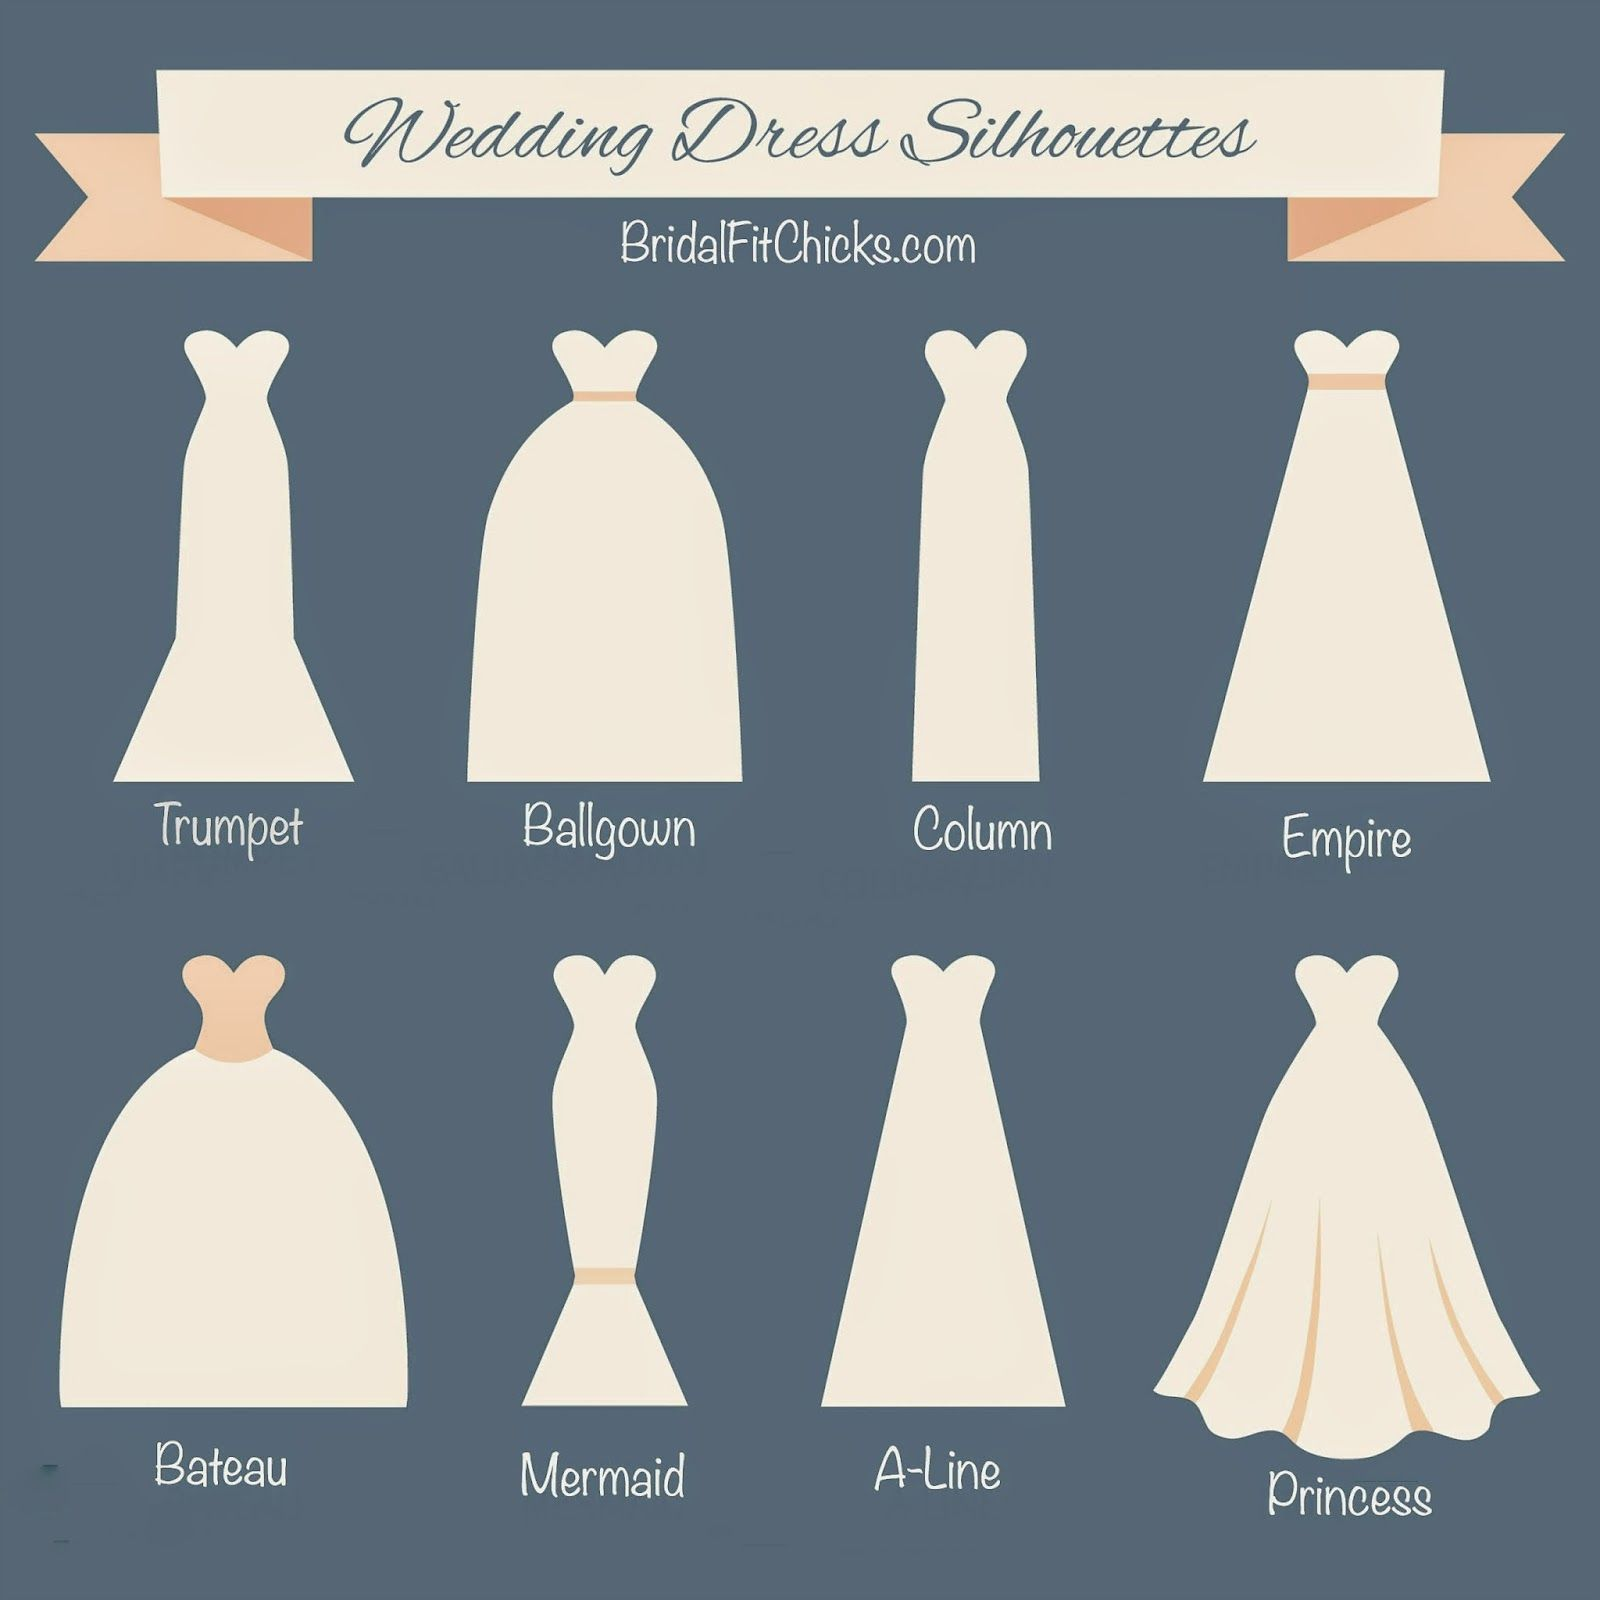 Wedding Dress Silhouettes Wedding Dress Styles Chart Wedding Dress Silhouette Wedding Dress Body Type